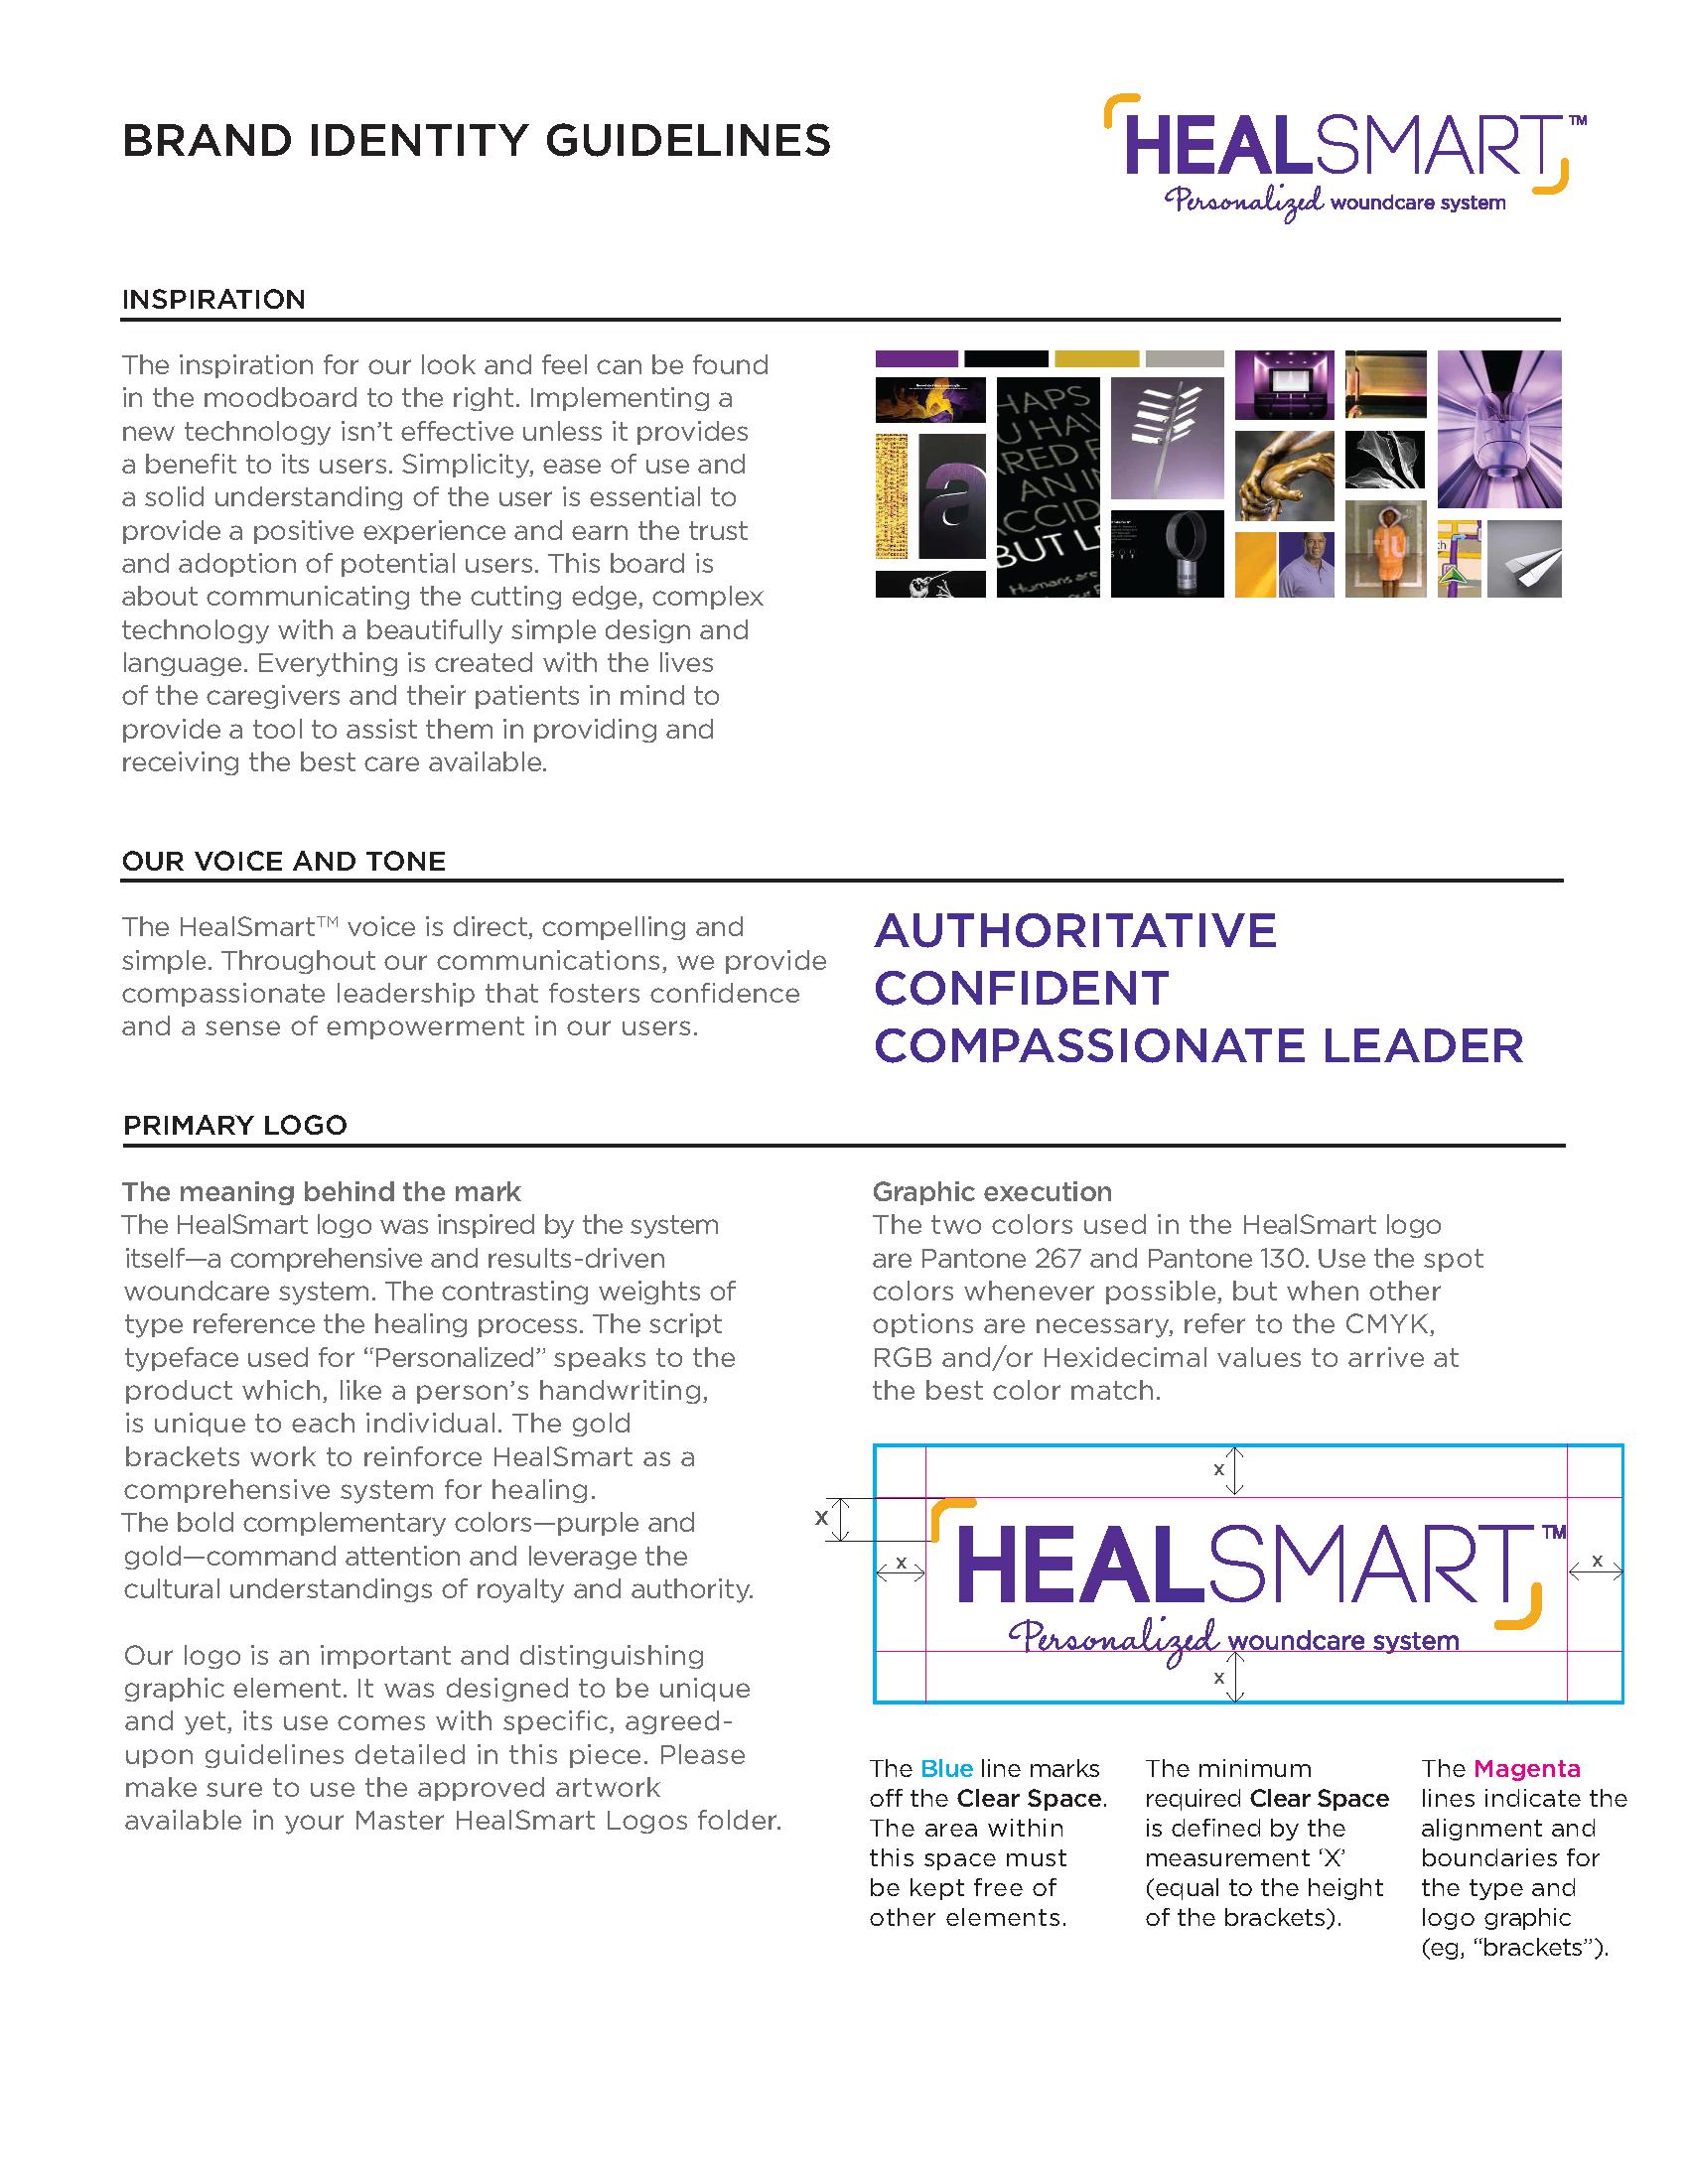 healsmart-2.jpg